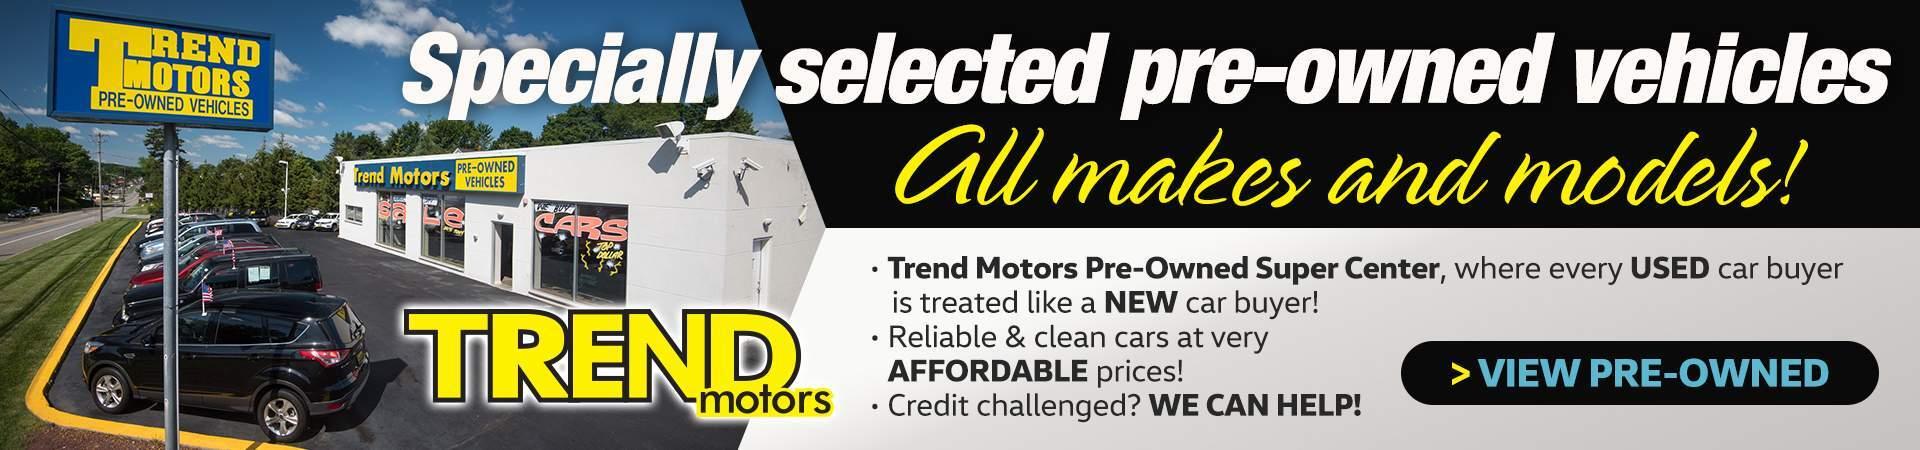 Jeep Lease Deals Nj >> Volkswagen Dealership Morris County NJ | Used Cars Trend ...